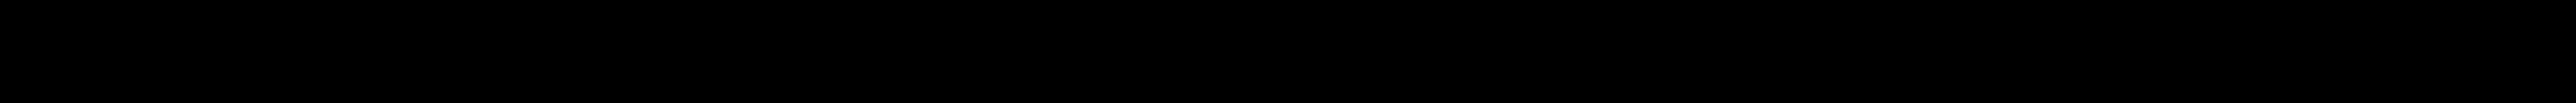 Fibonacci recurrence relation starting with 0